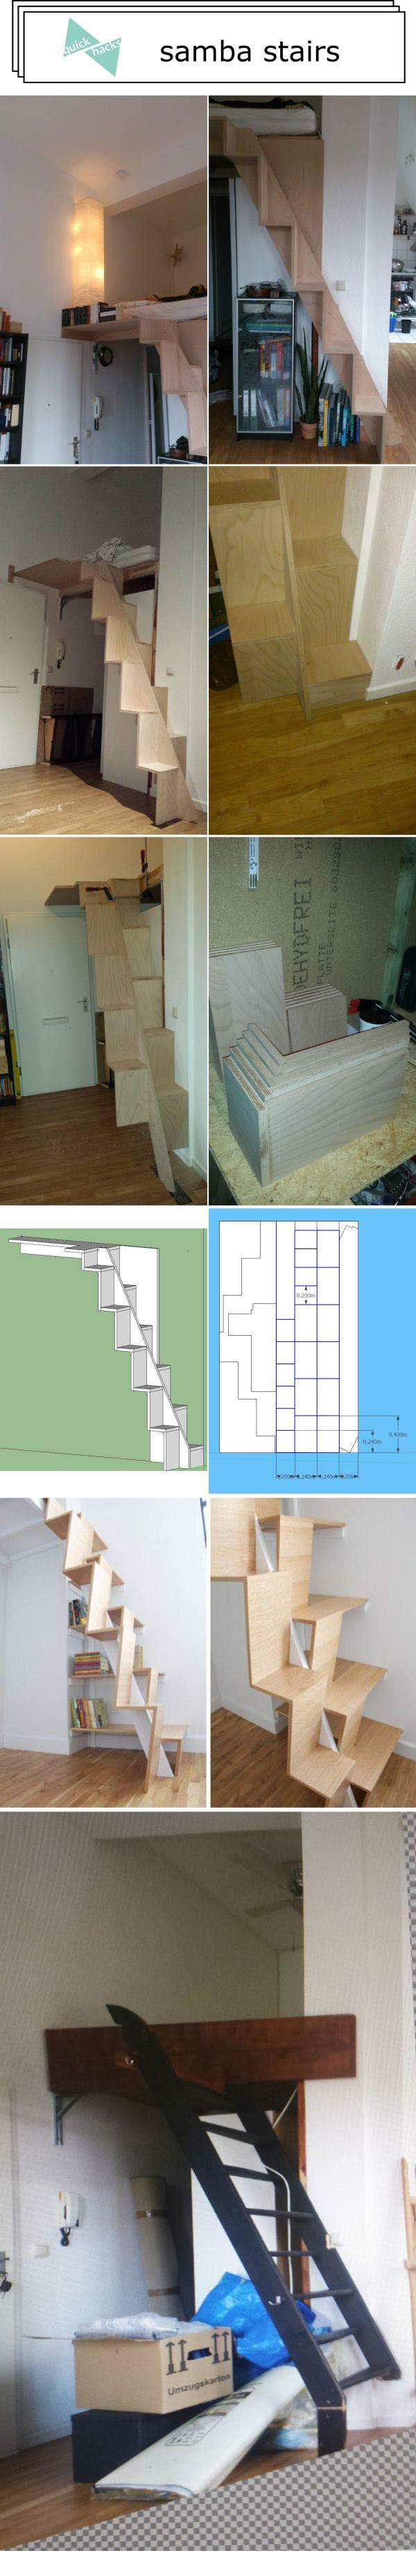 quickhacks.de - samba stairs - diy stairs - stairs of loft bed - Sambatreppe - Hochbett - Raumspartreppe